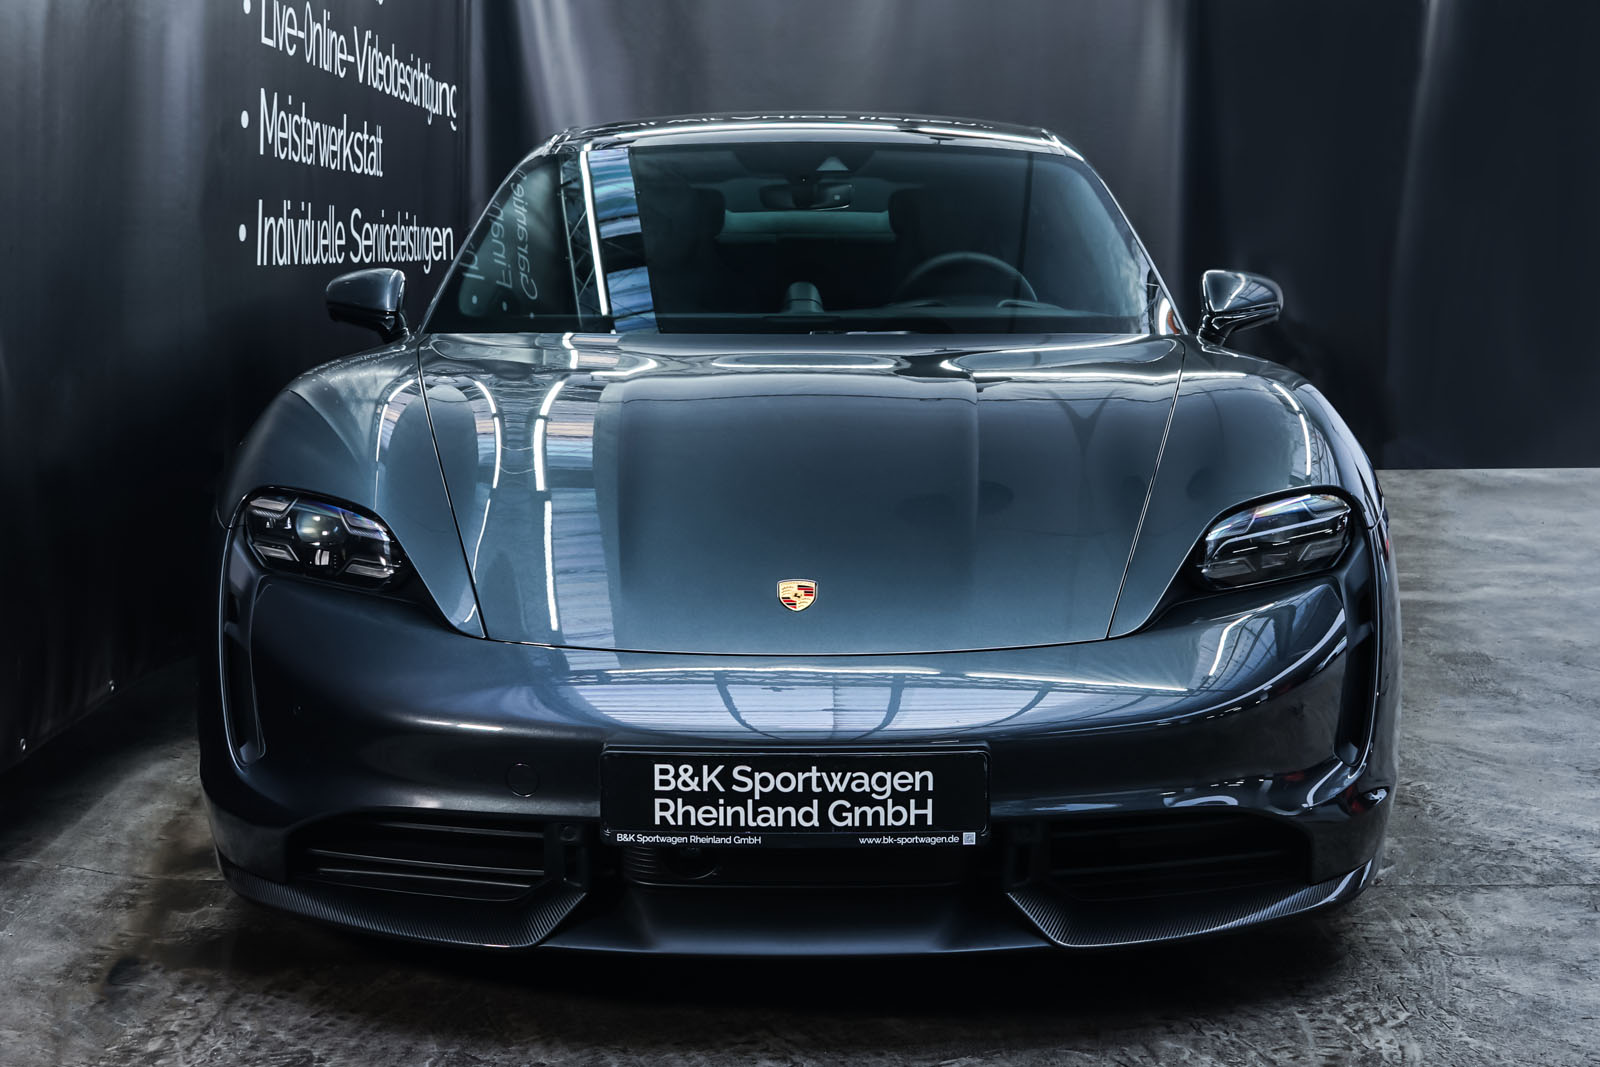 Porsche_Taycan_TurboS_Grau_Schwarz_POR-5353_1_w